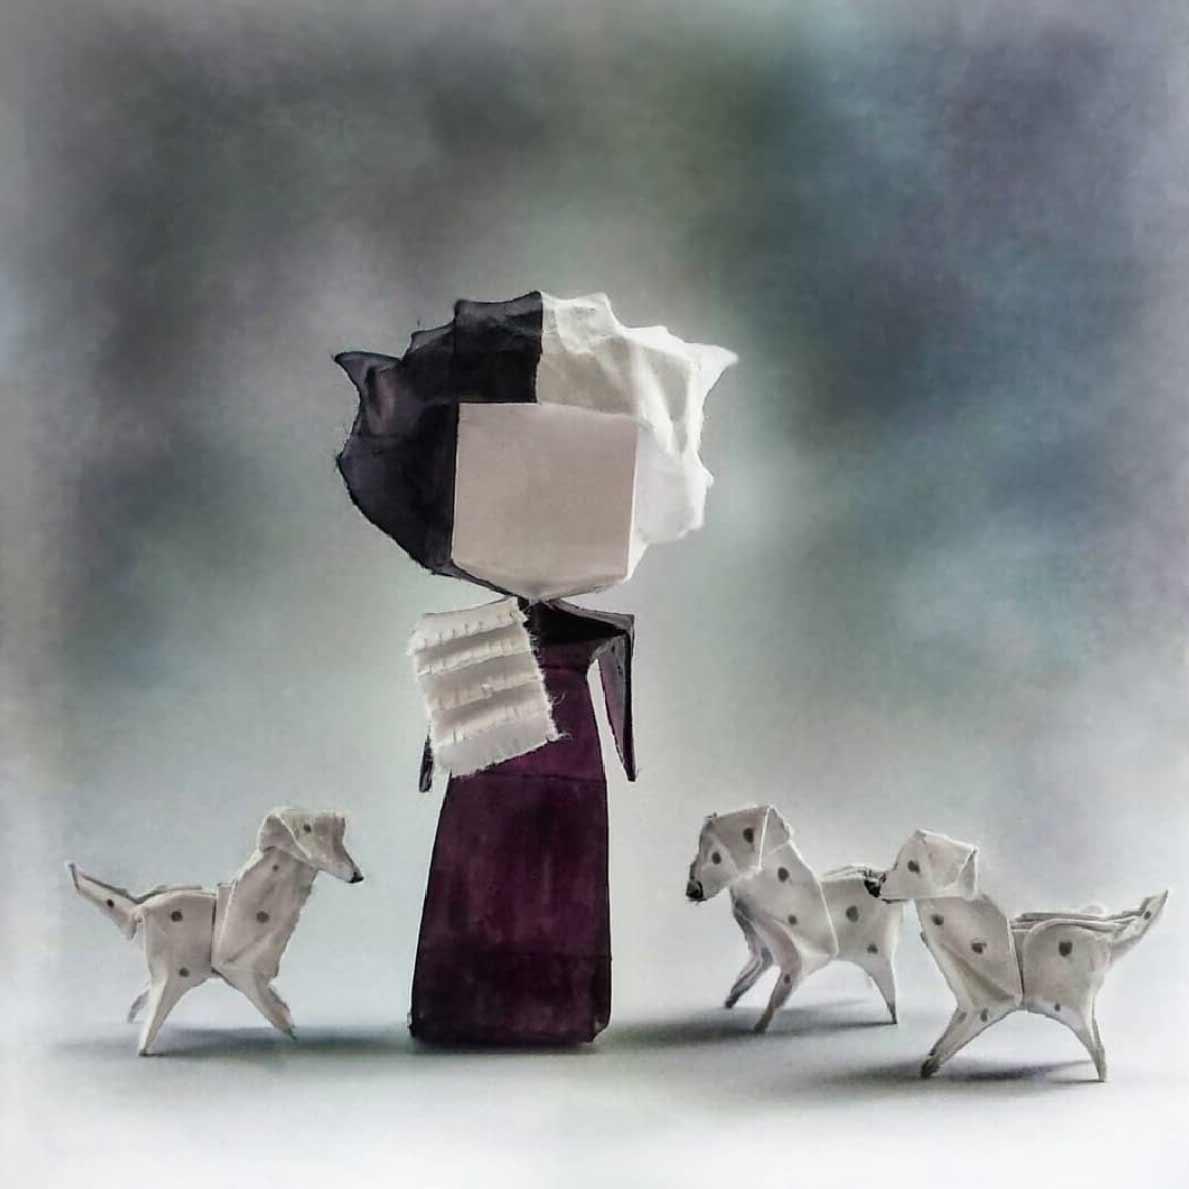 Popkultur-Origami-Figuren von Louise Cassidy origami-figuren-Louise-Cassidy_03